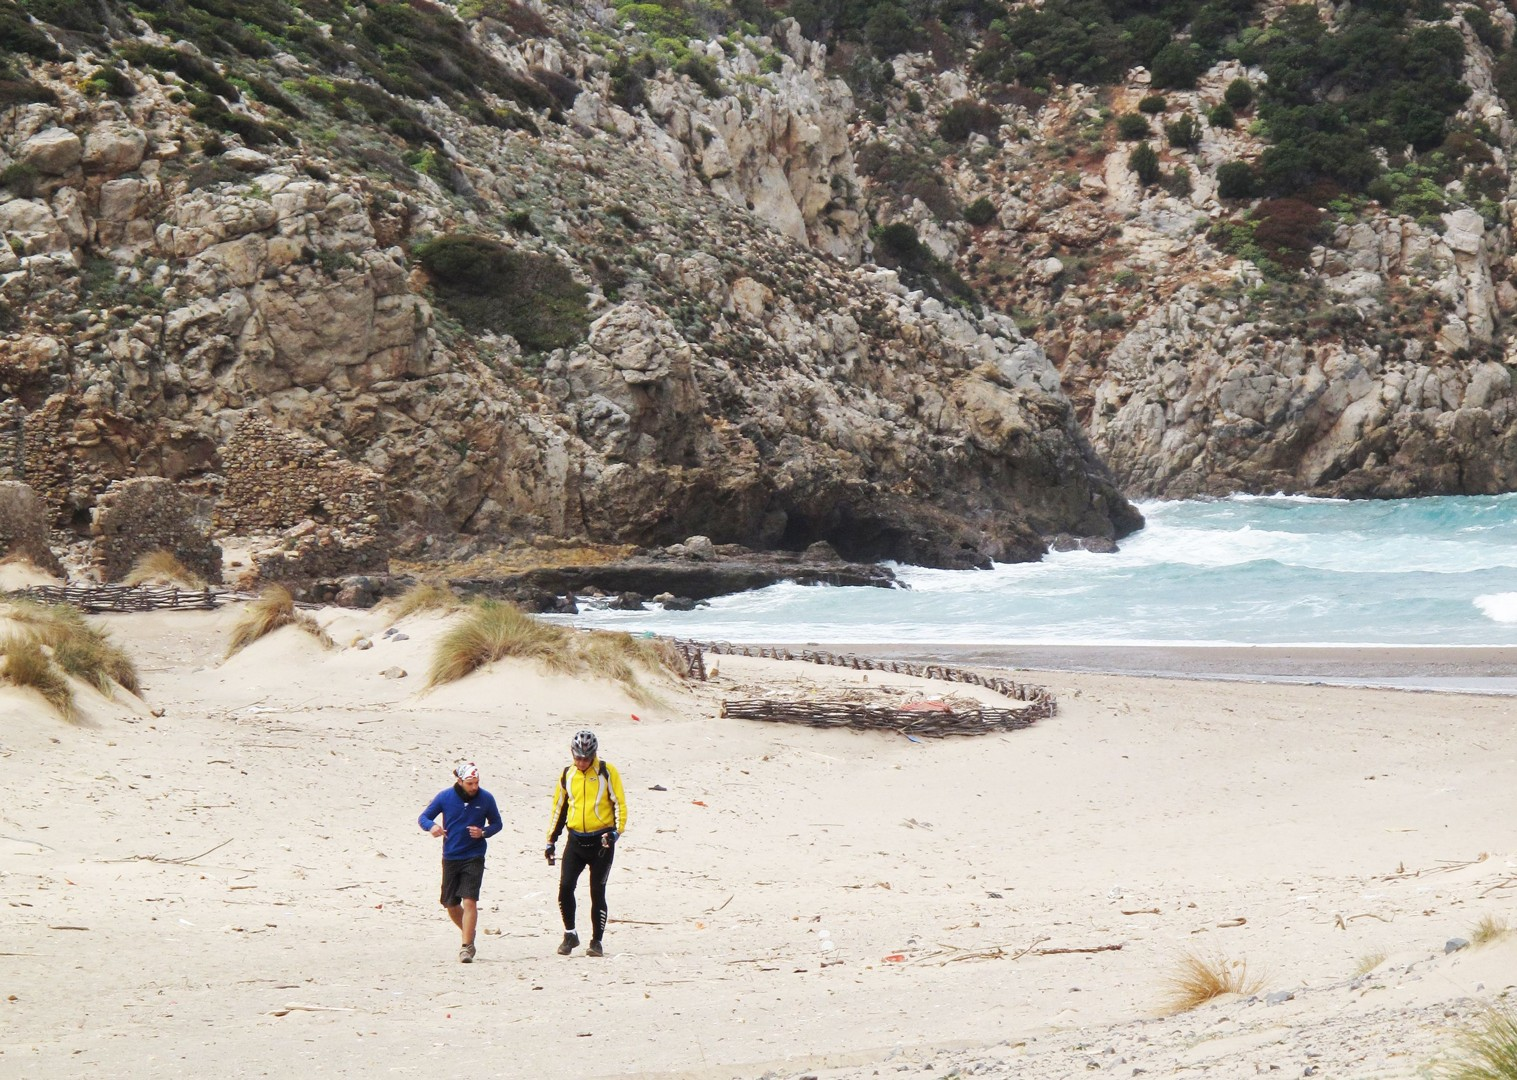 italian-beaches-sardinia-guided-holiday.jpg - Sardinia - Island Flavours - Guided Leisure Cycling Holiday - Leisure Cycling